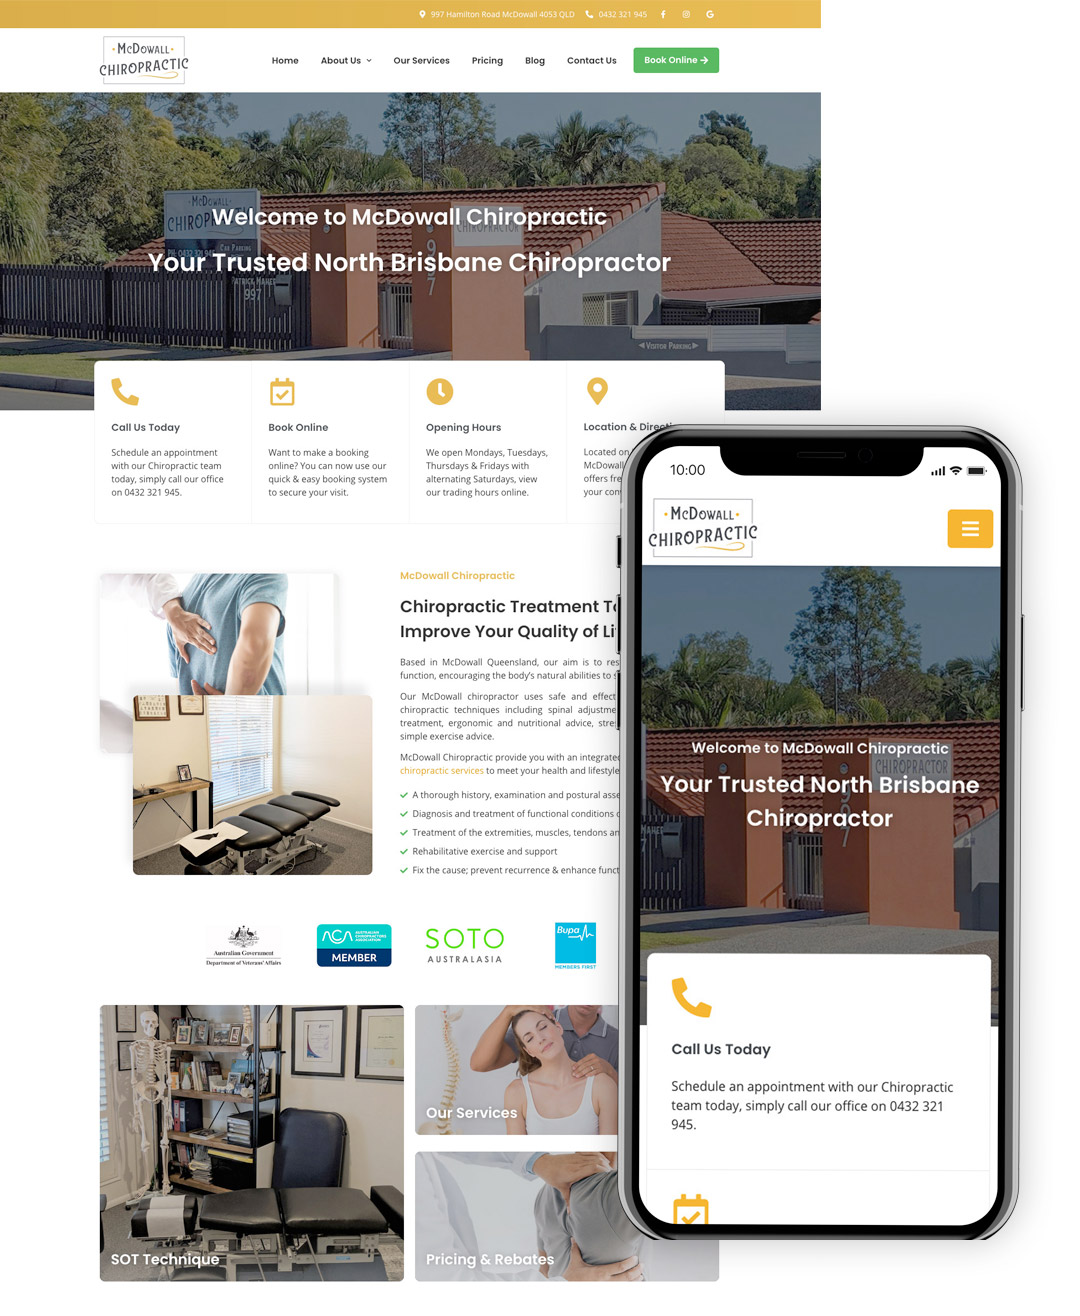 McDowall Chiropractic Showcase - OnePoint Solutions - Website Design Brisbane QLD Australia